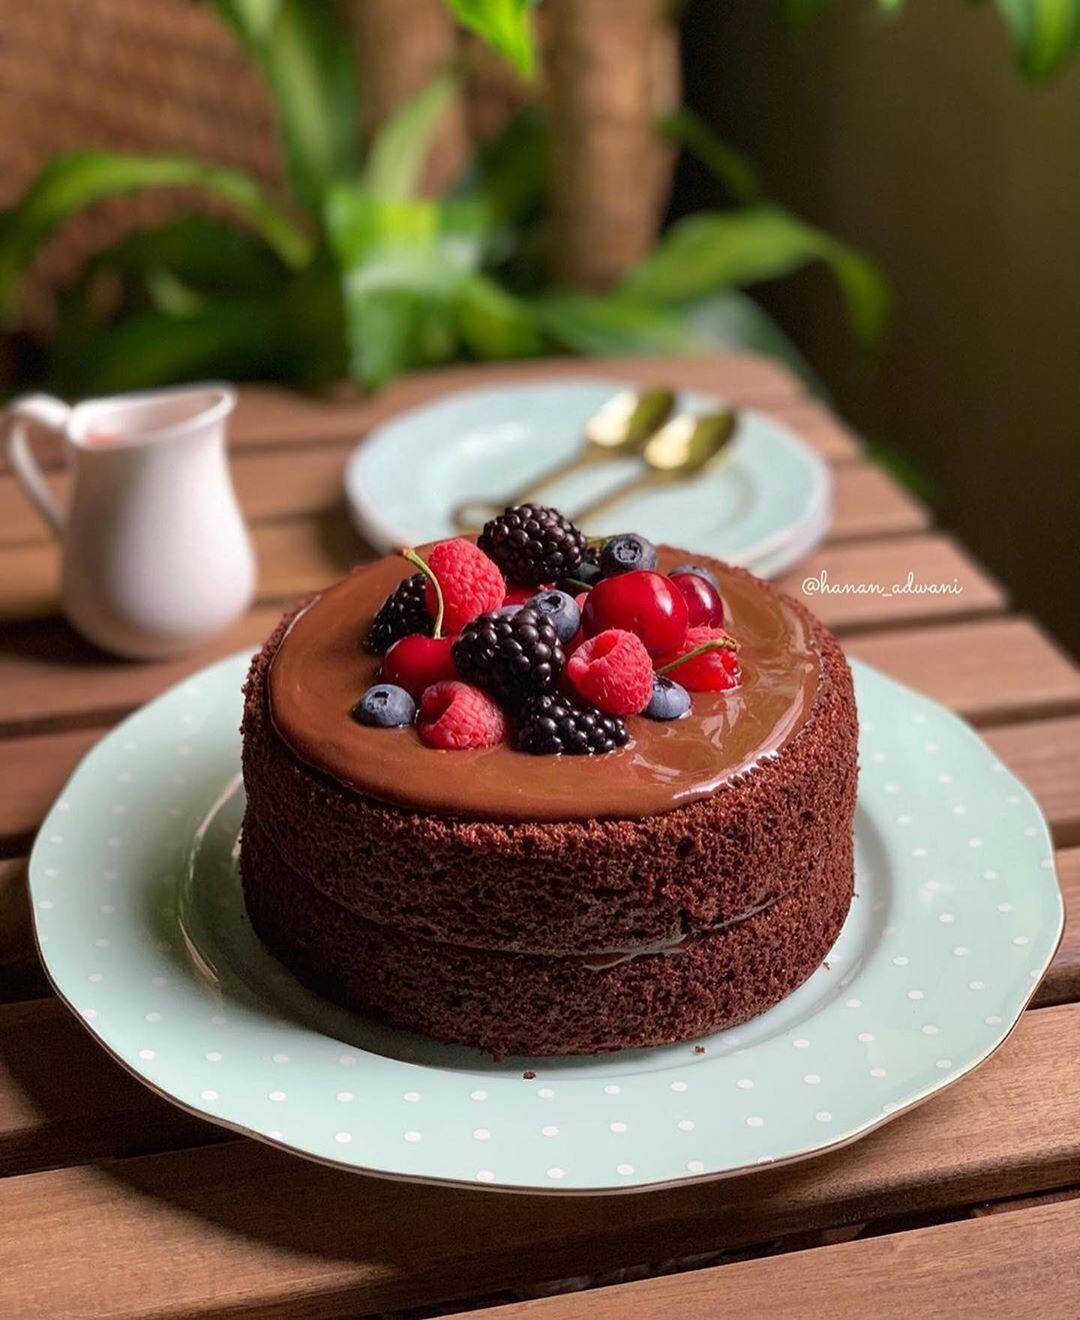 2 022 Likes 59 Comments اجمل الوصفات والذها Wasfat55 On Instagram كيكة الشكولاته بجناش الجالكسي سويت خليط كيك جاهز با Desserts Food Mini Cheesecake